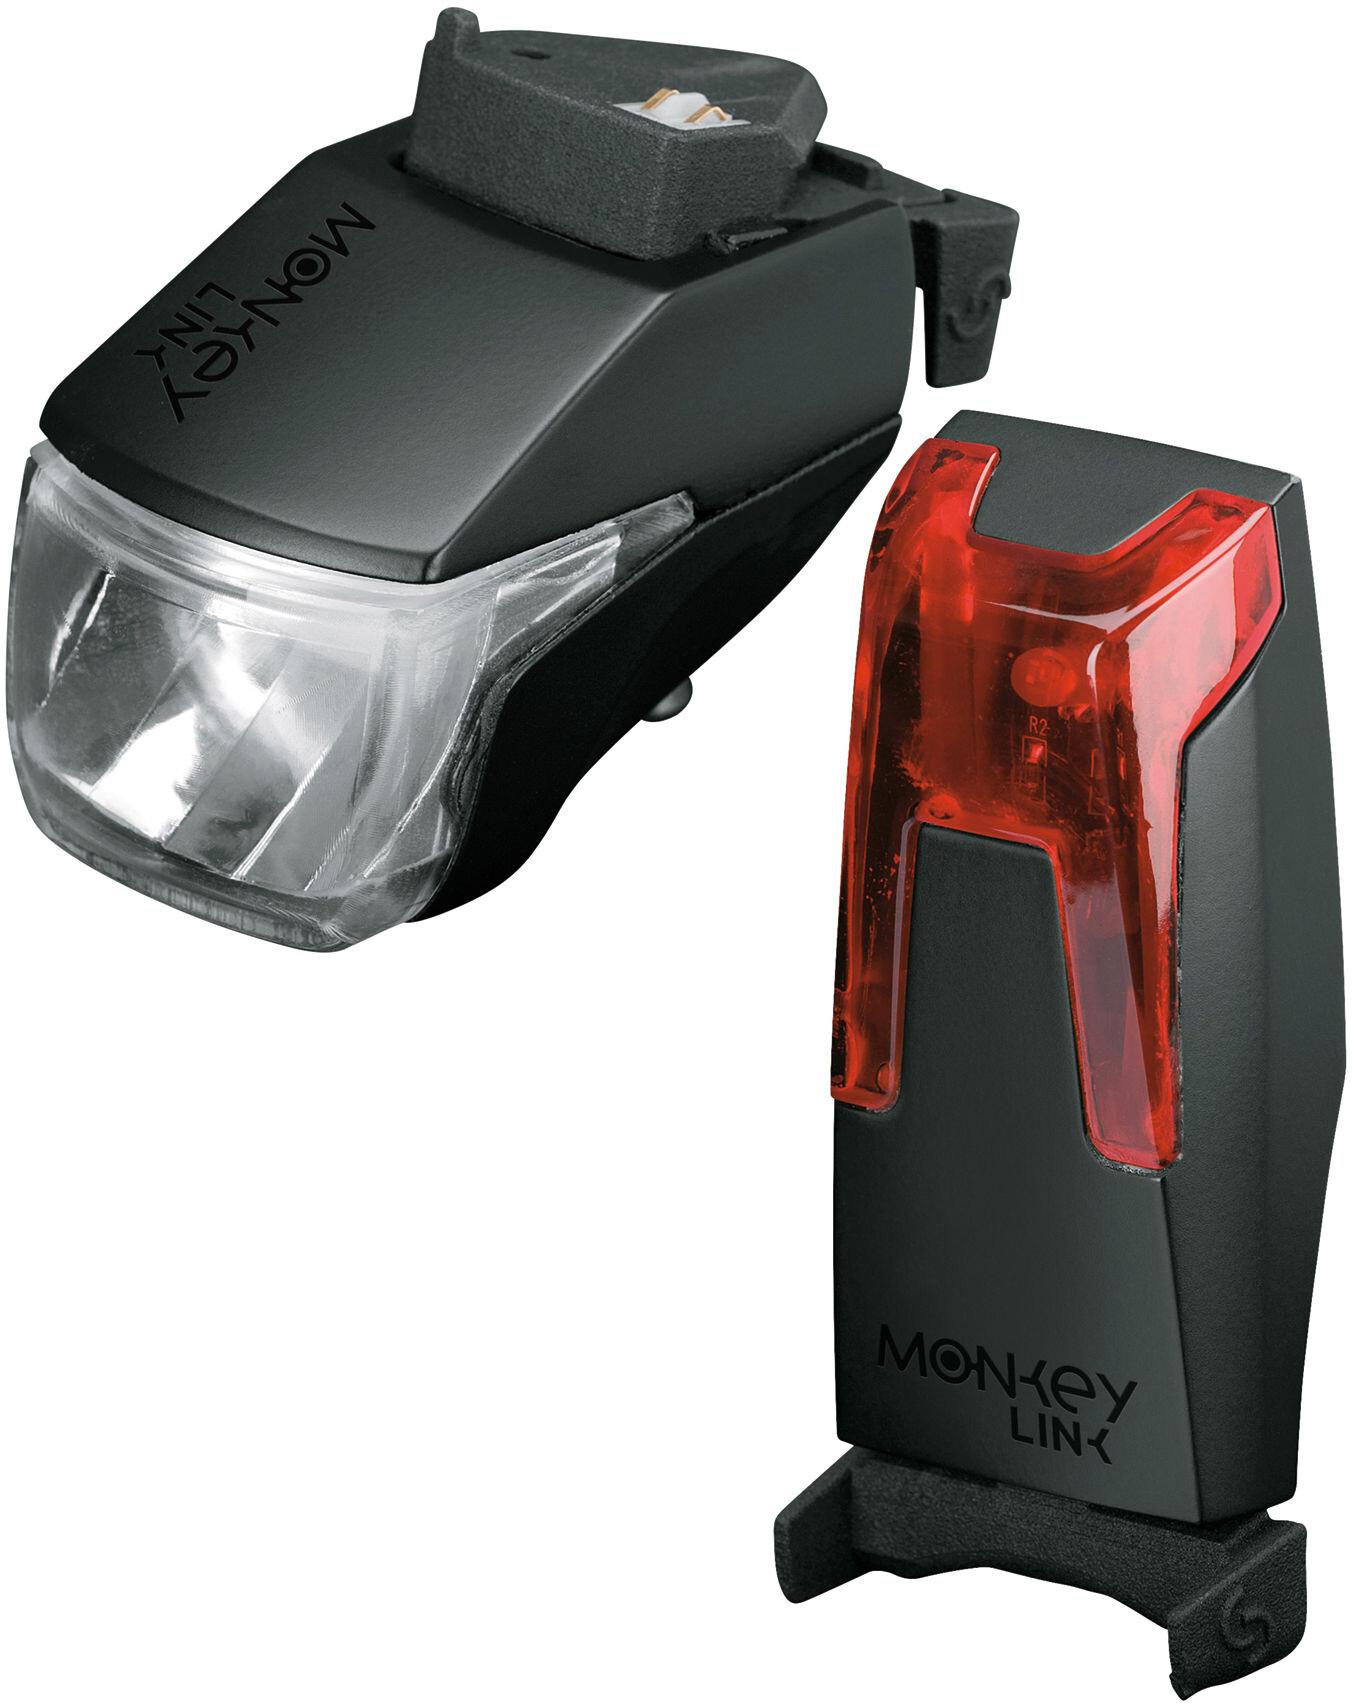 Monkeylink monkeylight bike light set 70 lux set refill